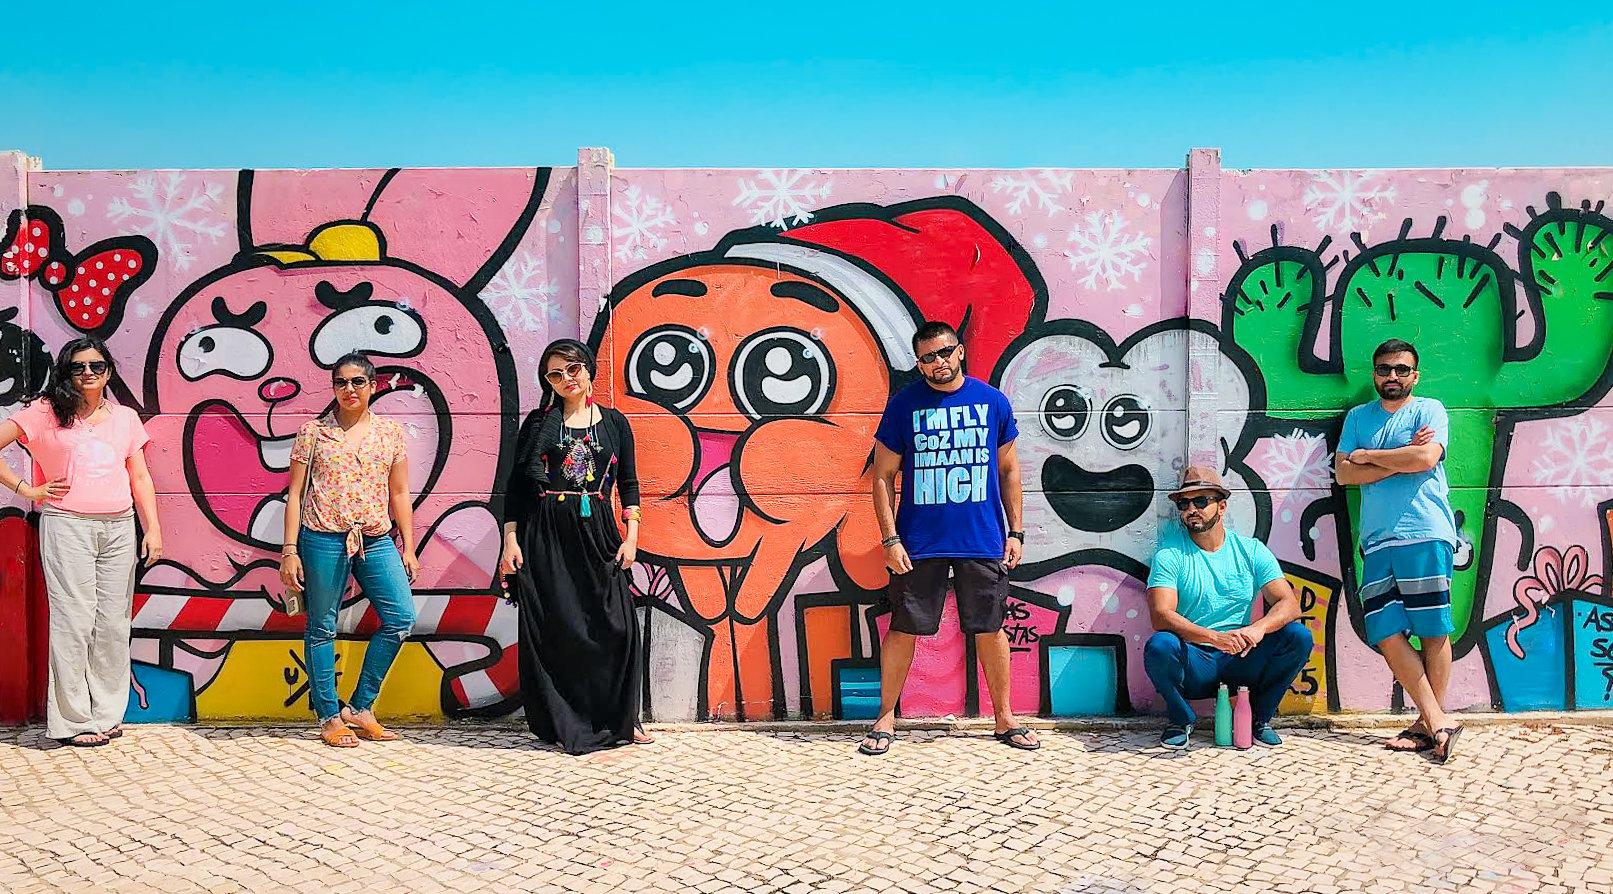 Muslim friends with graffiti wall in Algarve